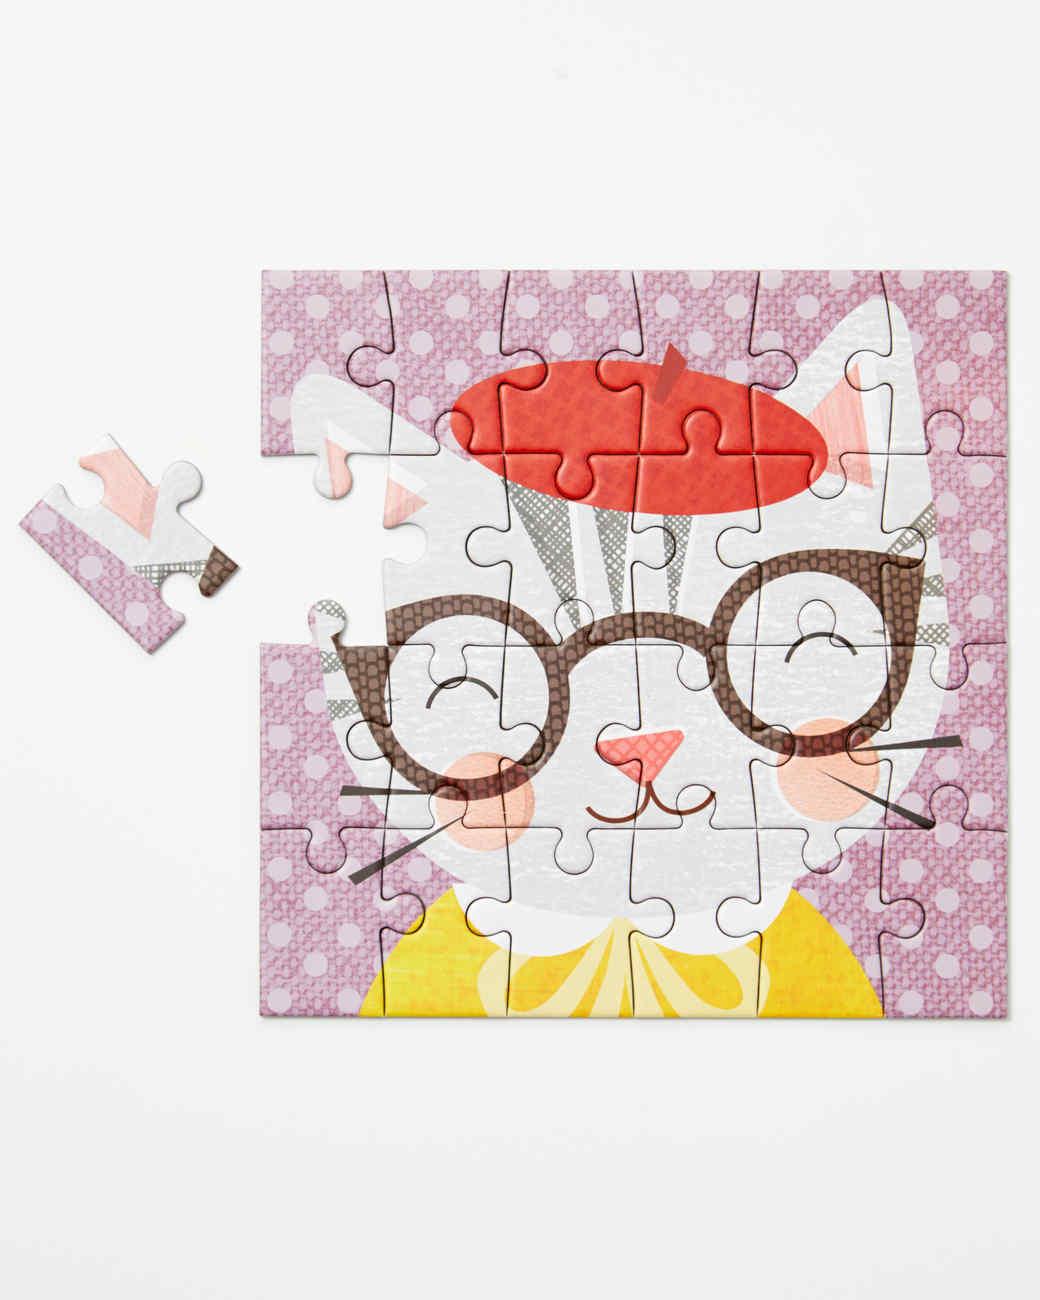 crafty-girl-basket-puzzle-3686-d112789-0116.jpg